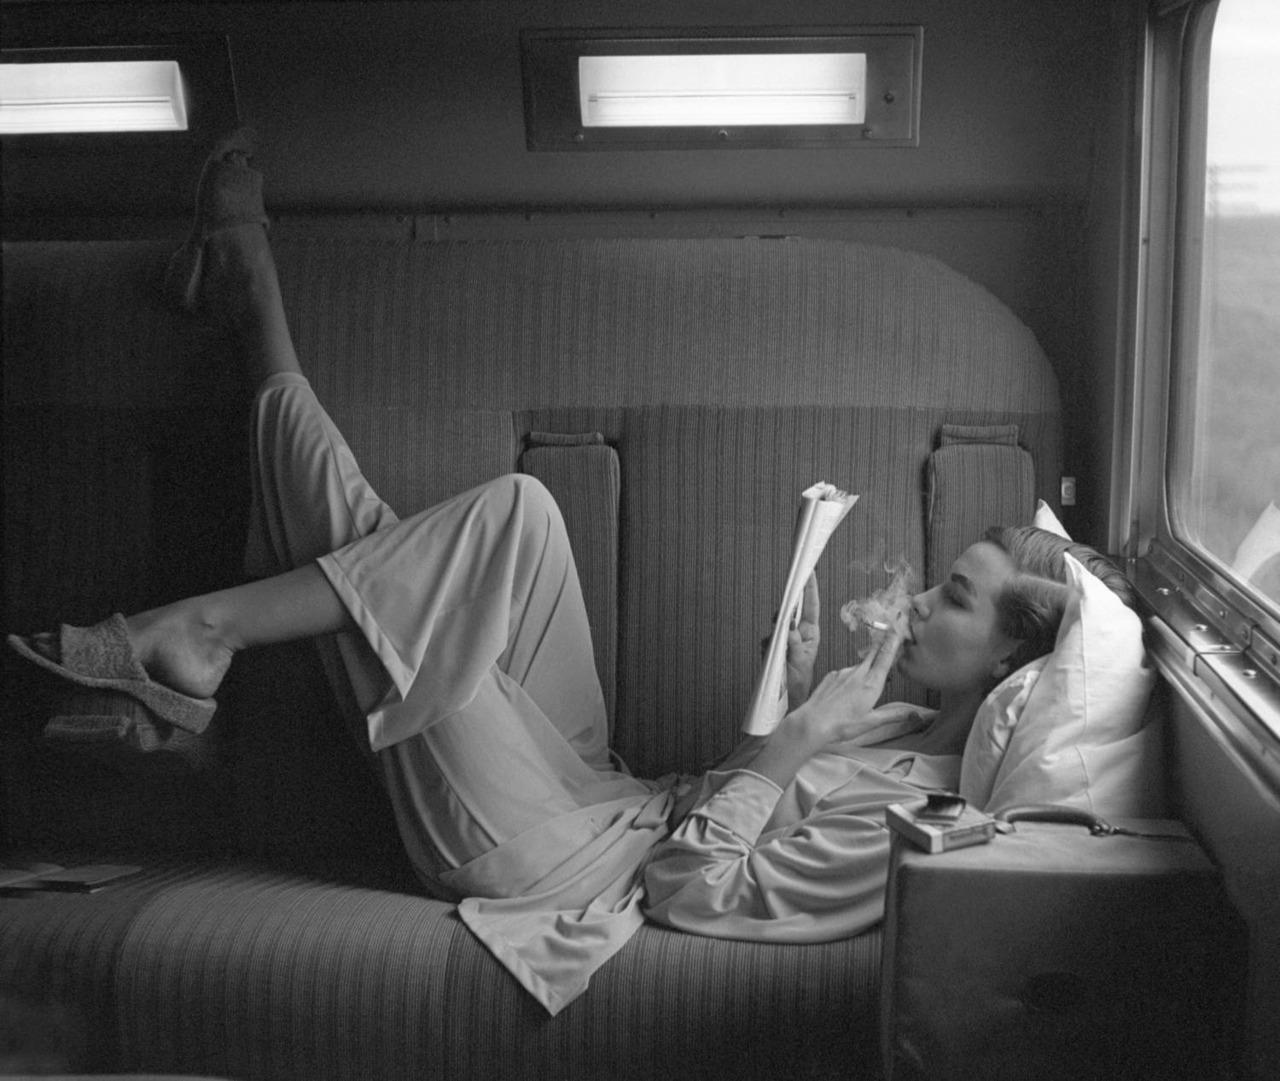 Photography: Lillian Bassman, 1951